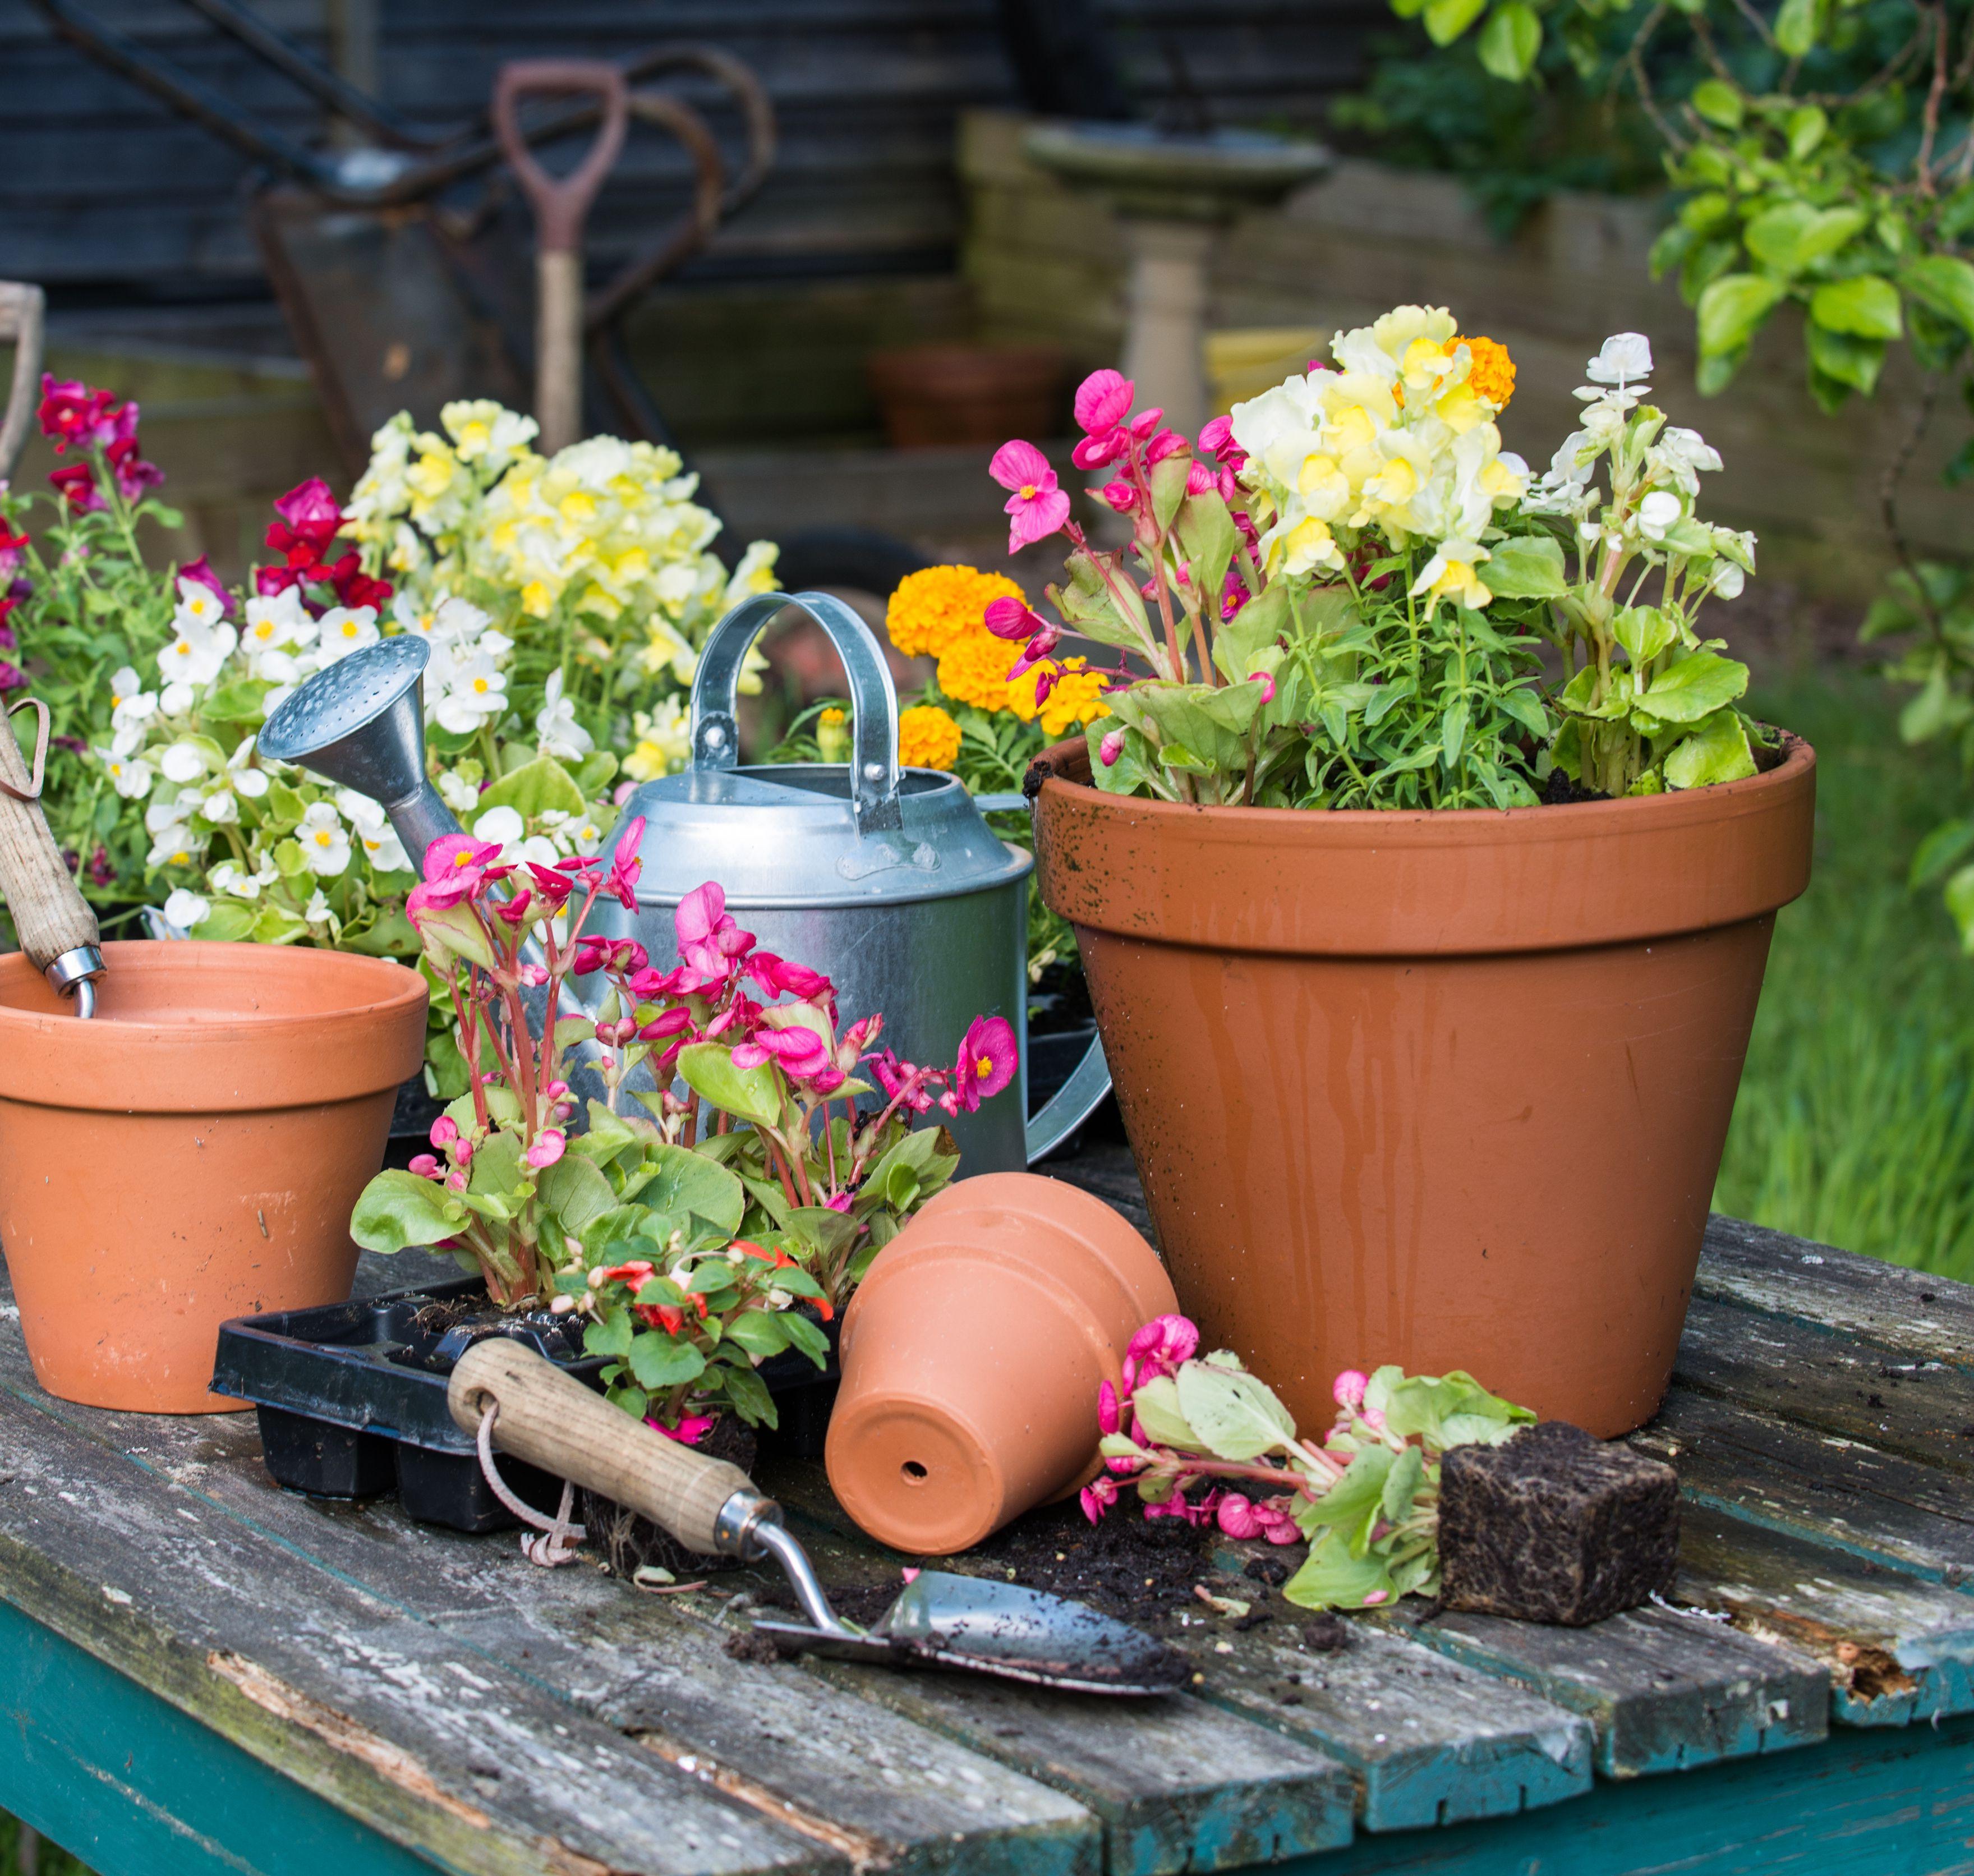 Flower Garden: Flower Garden And Gardening Care And Tips